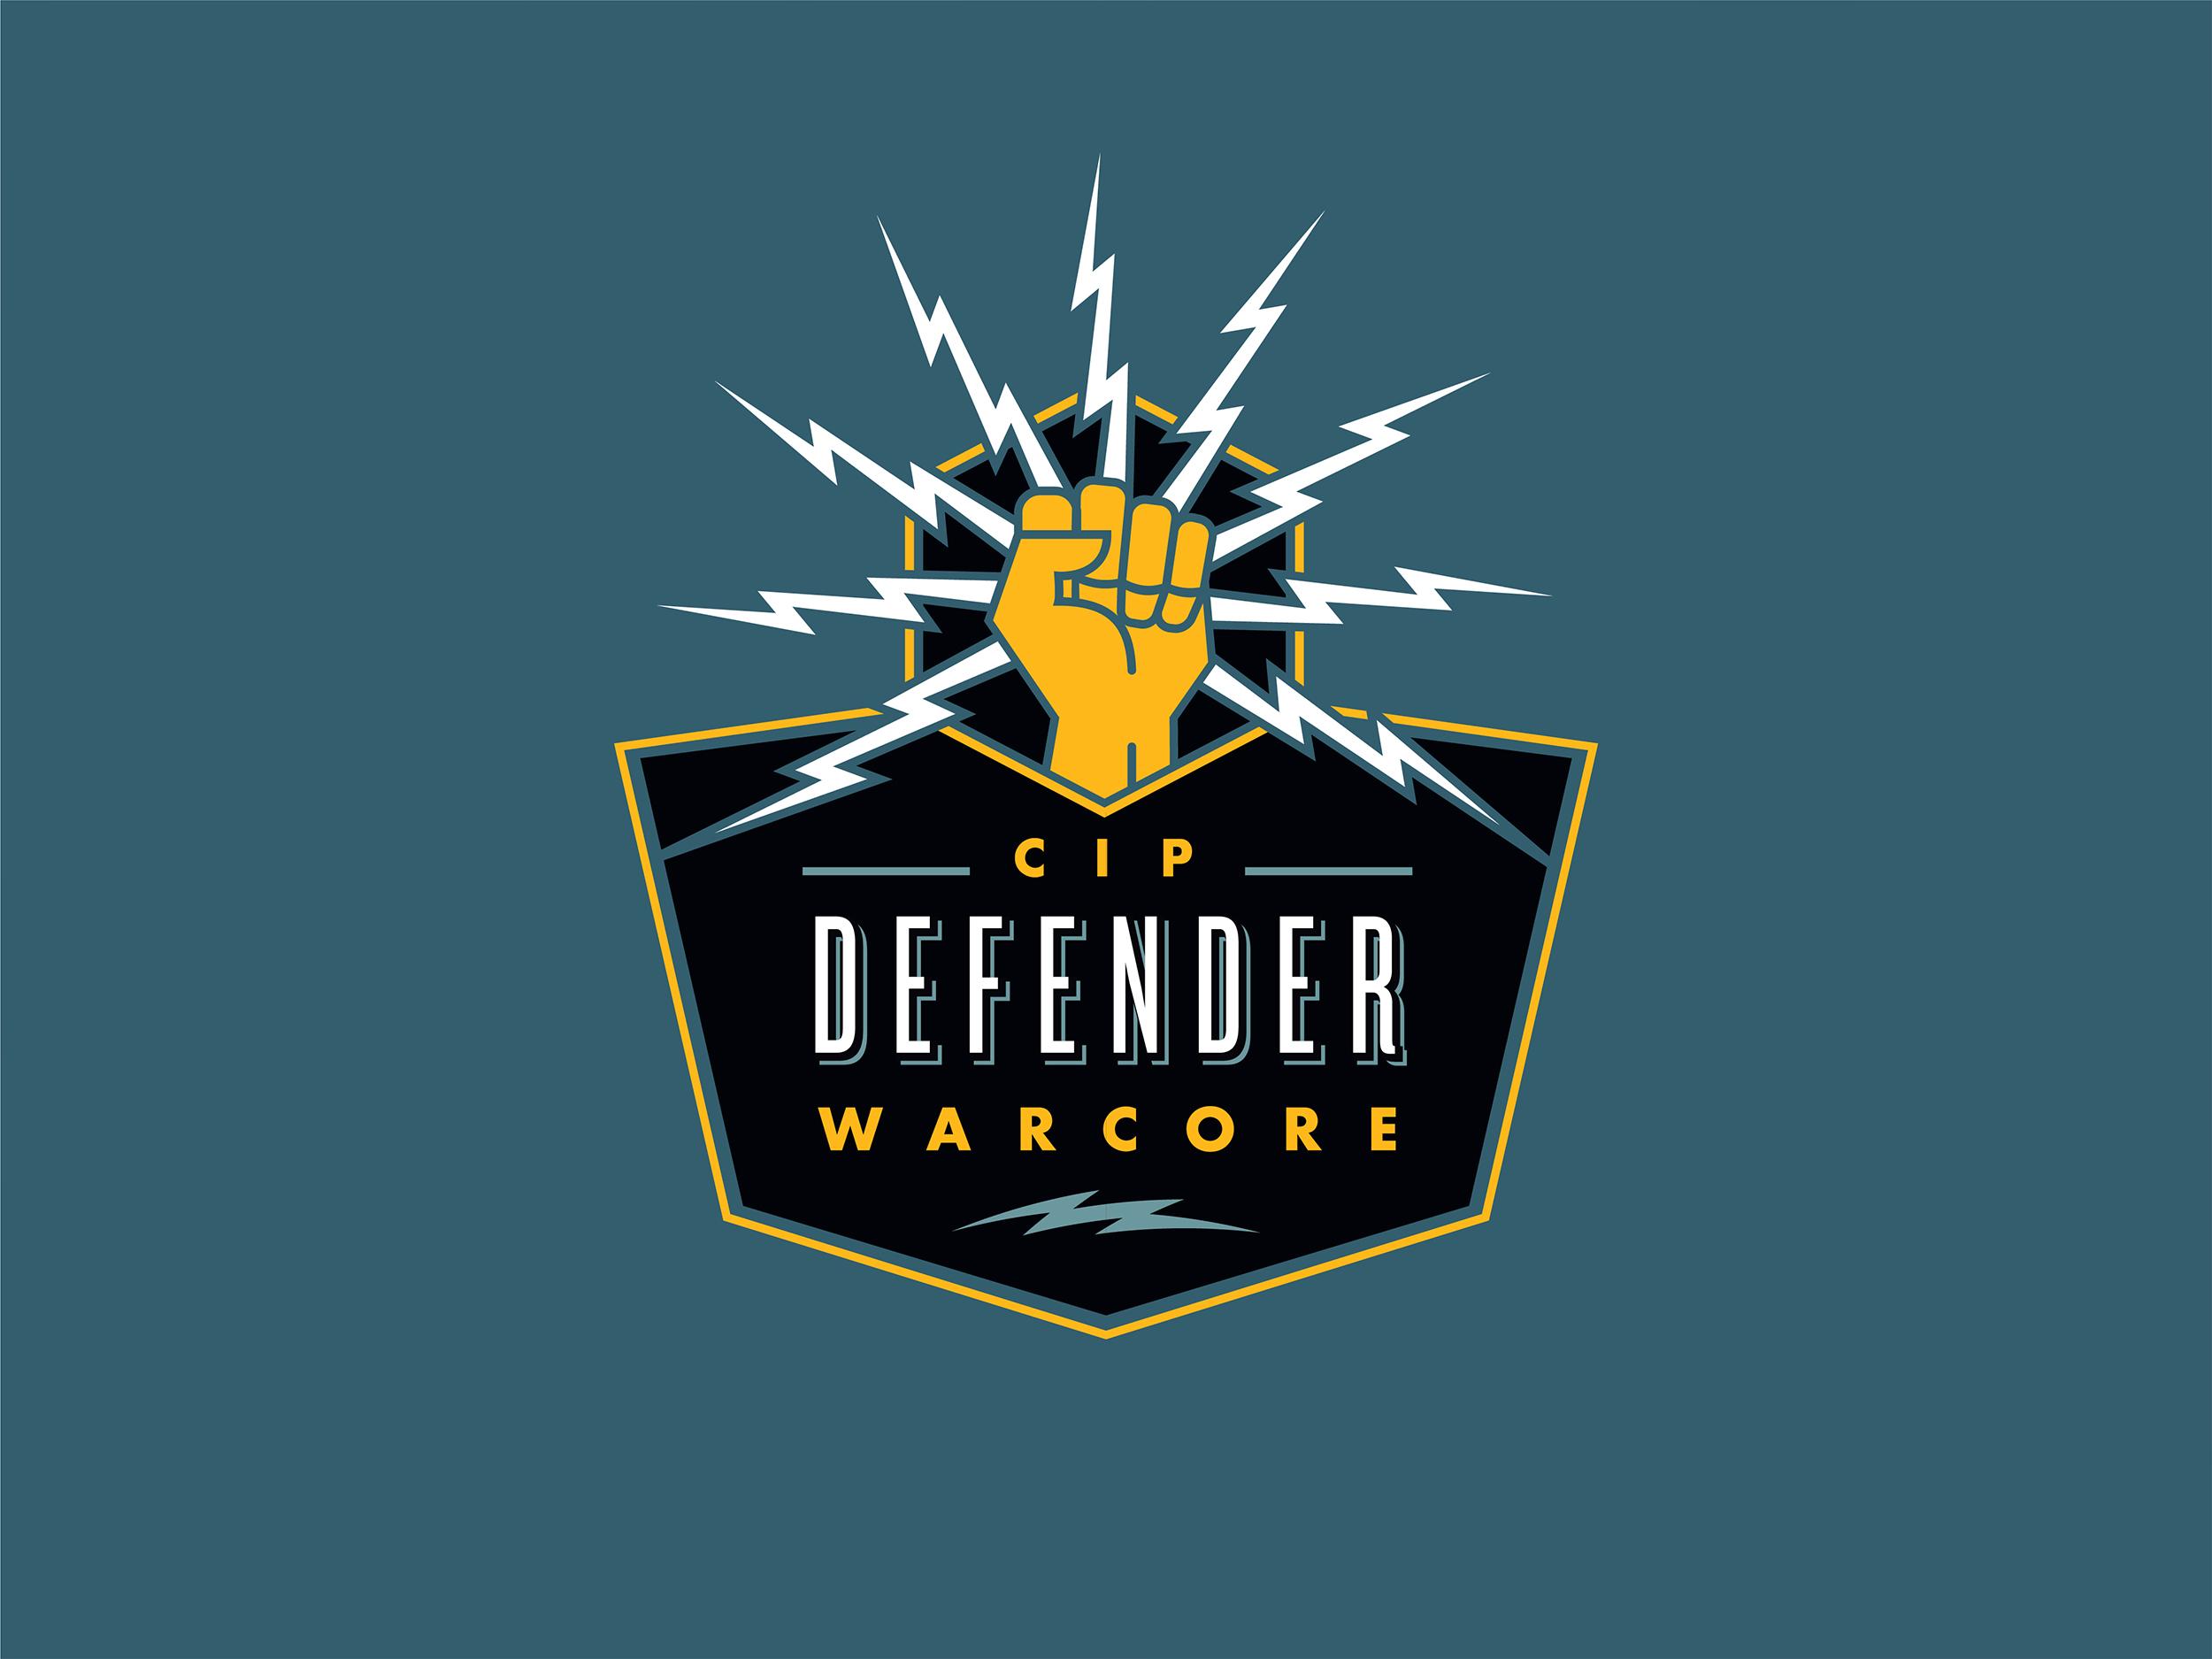 CIP Defender